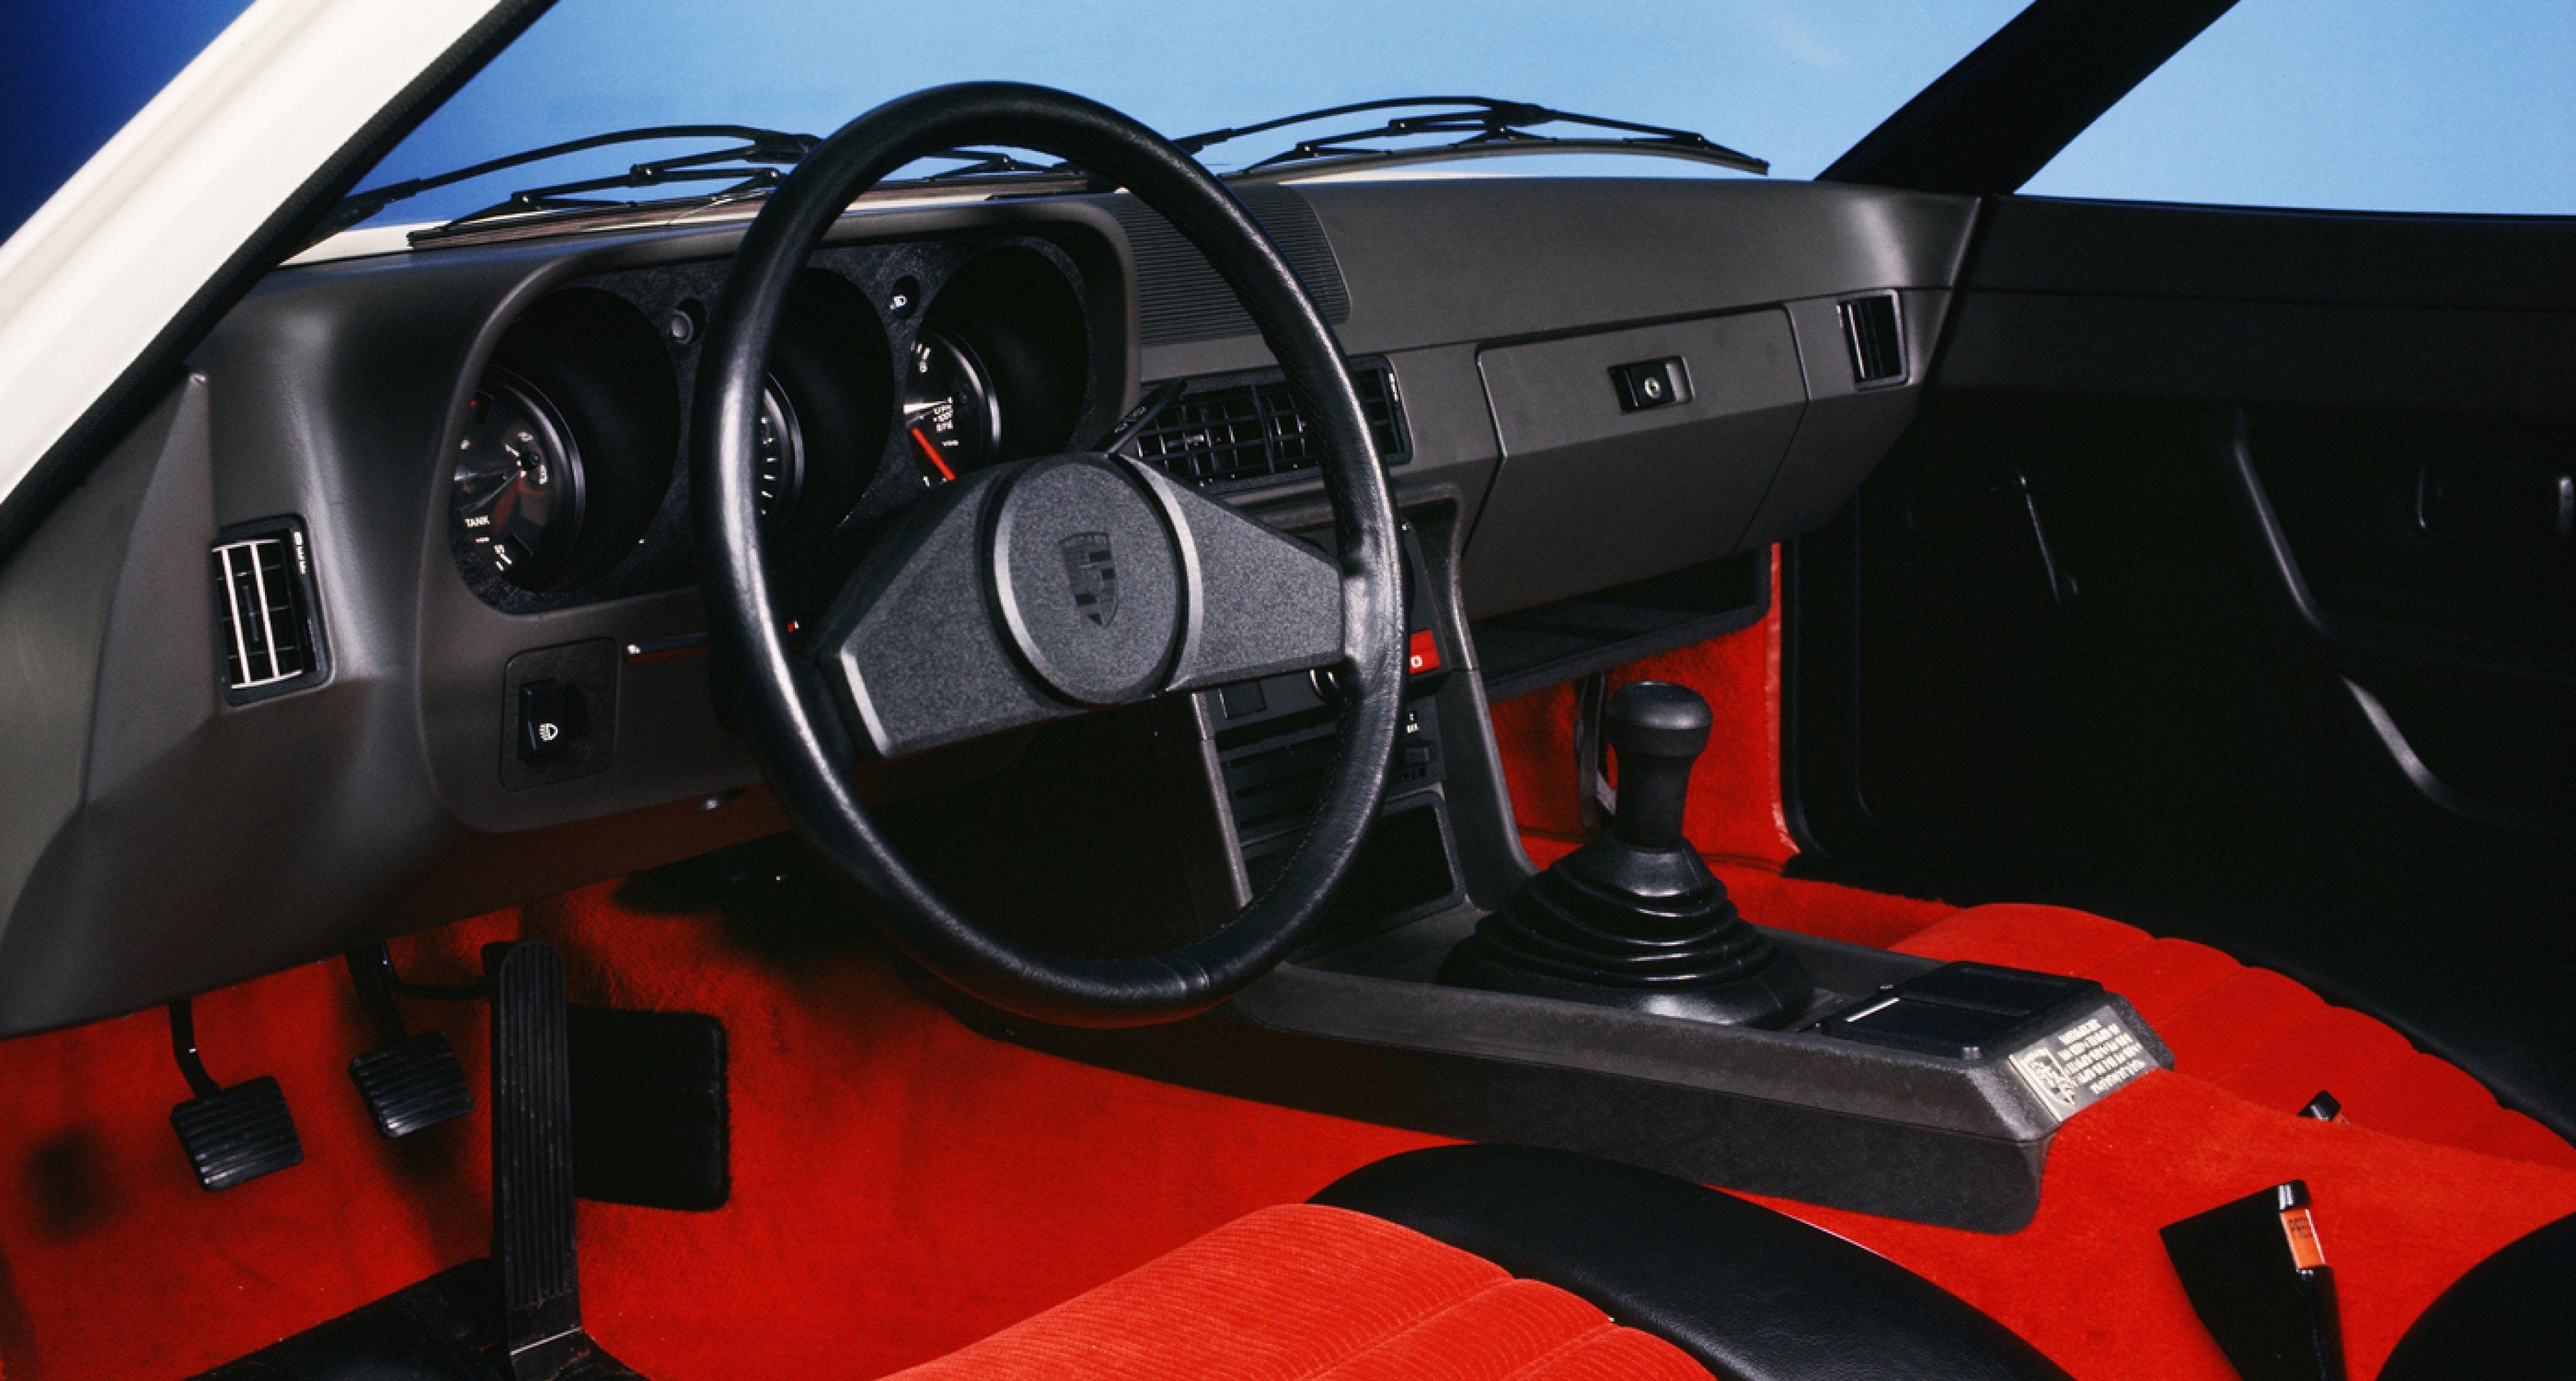 Red corduroy interior of a 1977 Porsche 924 Martini edition.